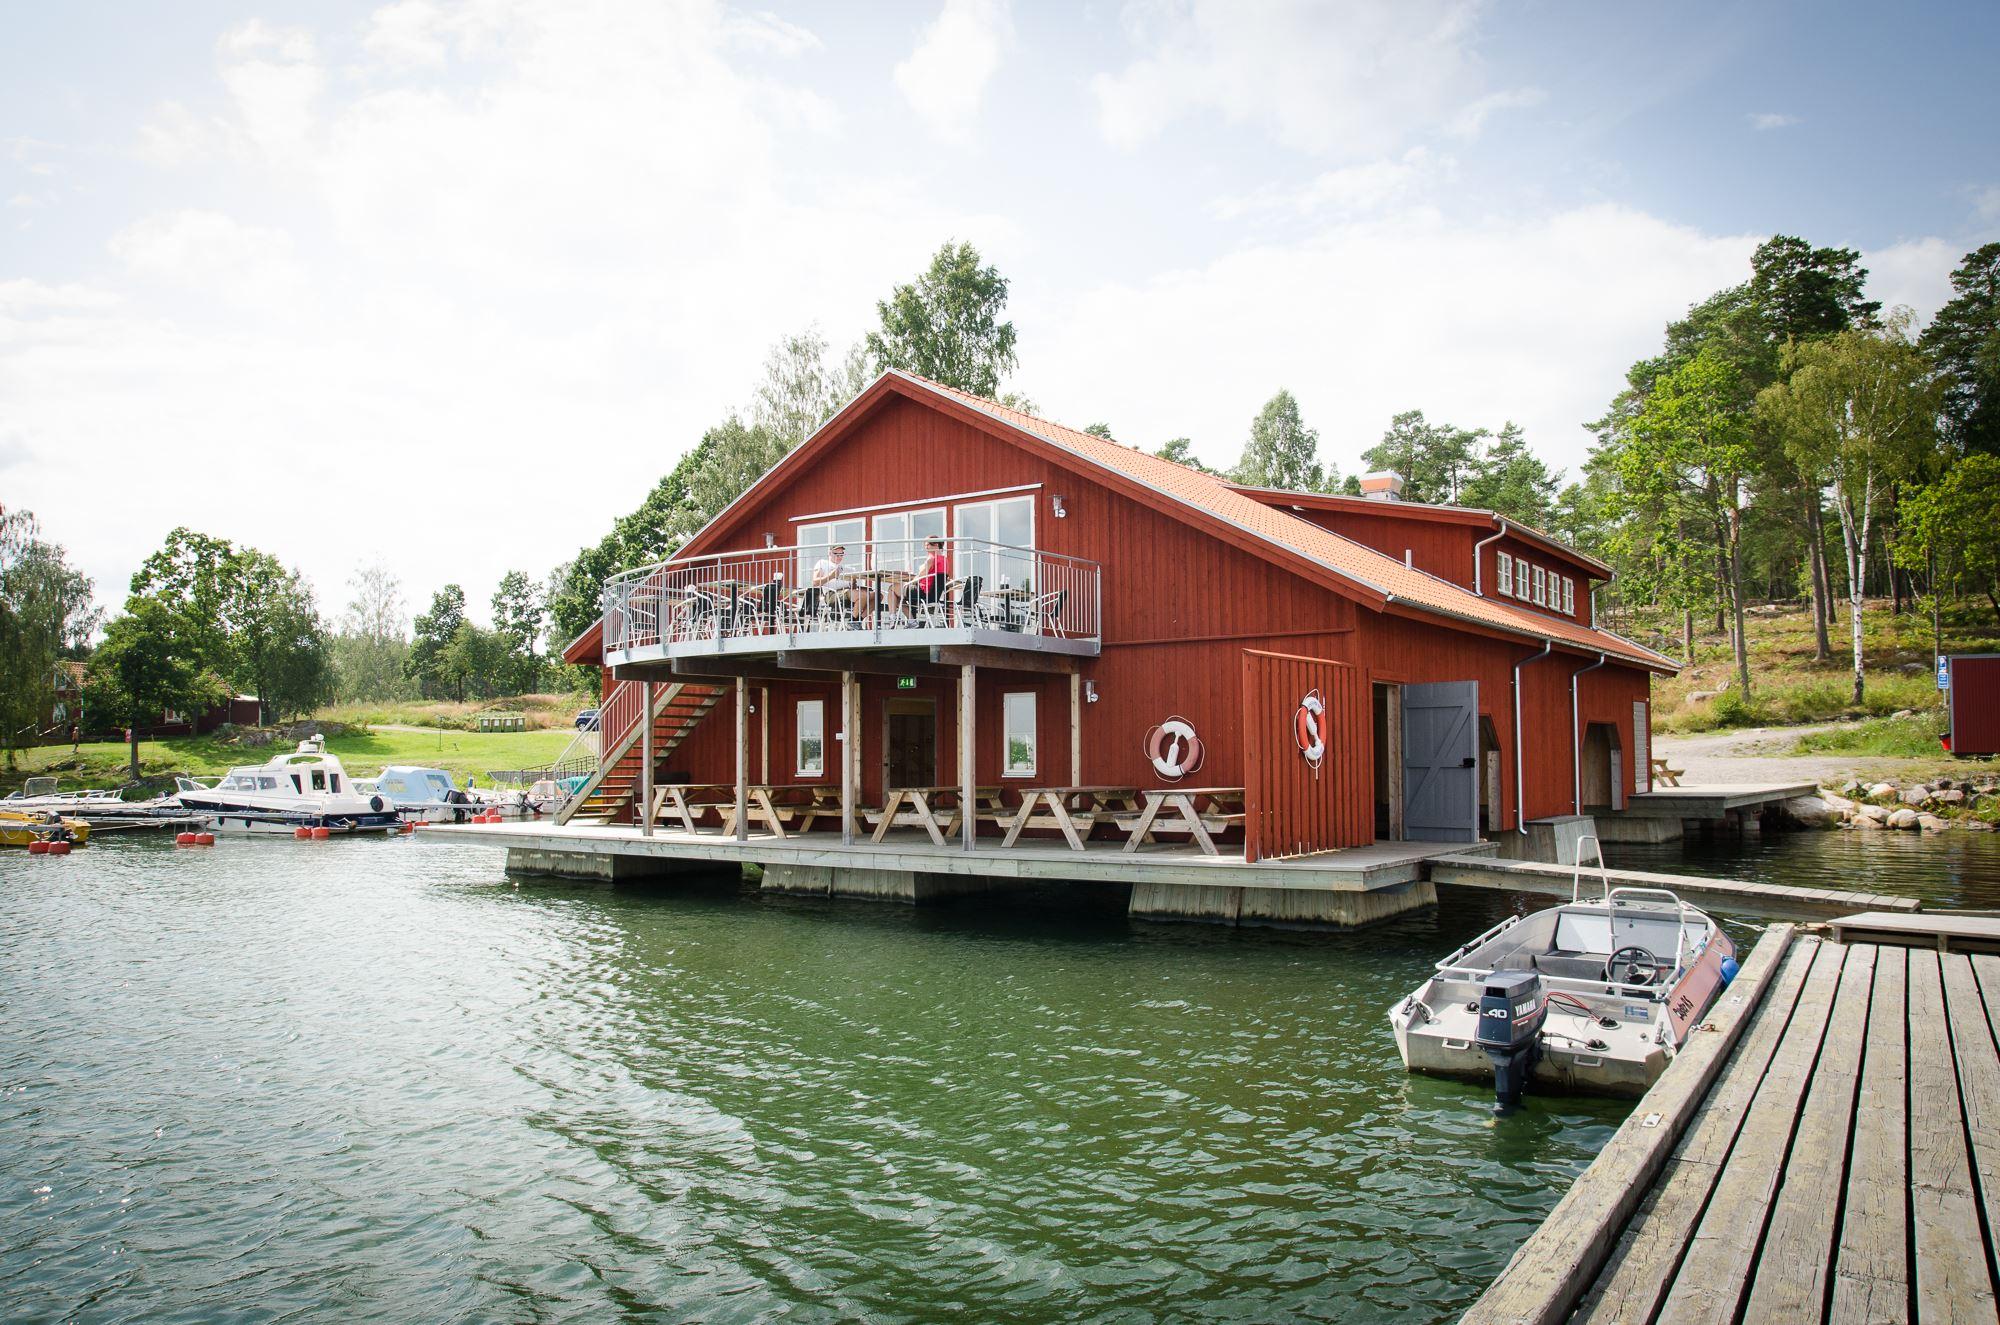 Skärgårdsbyn S:t Anna Mon/Cottages